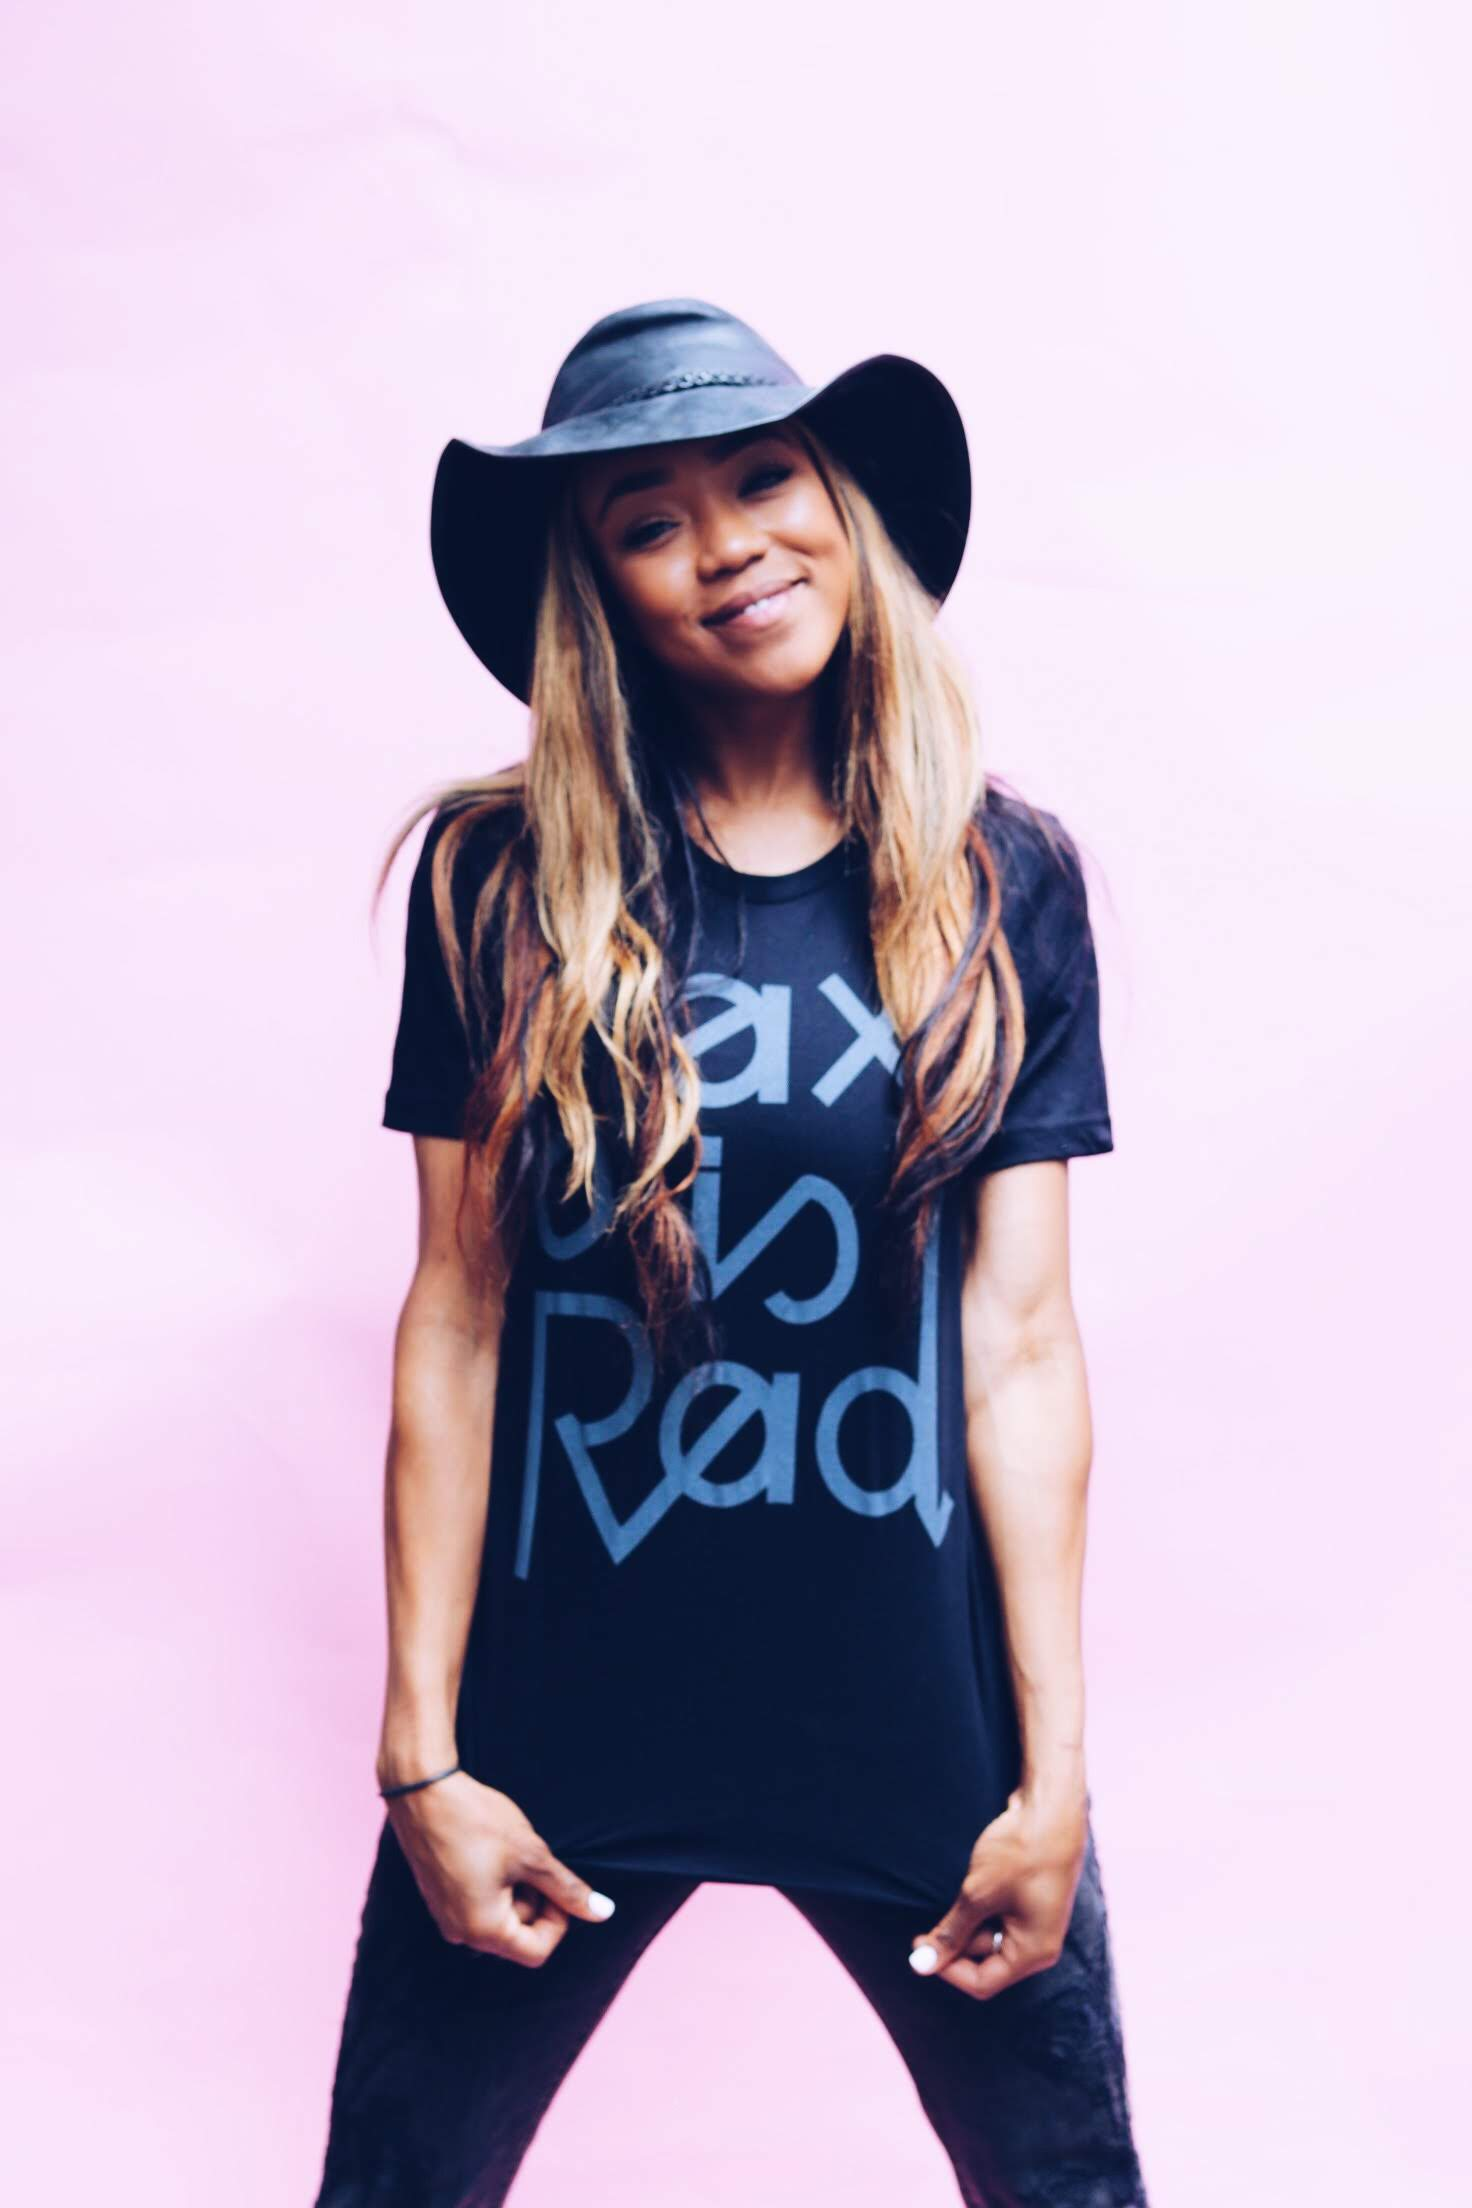 Victoria Crawford aka Alicia Fox -